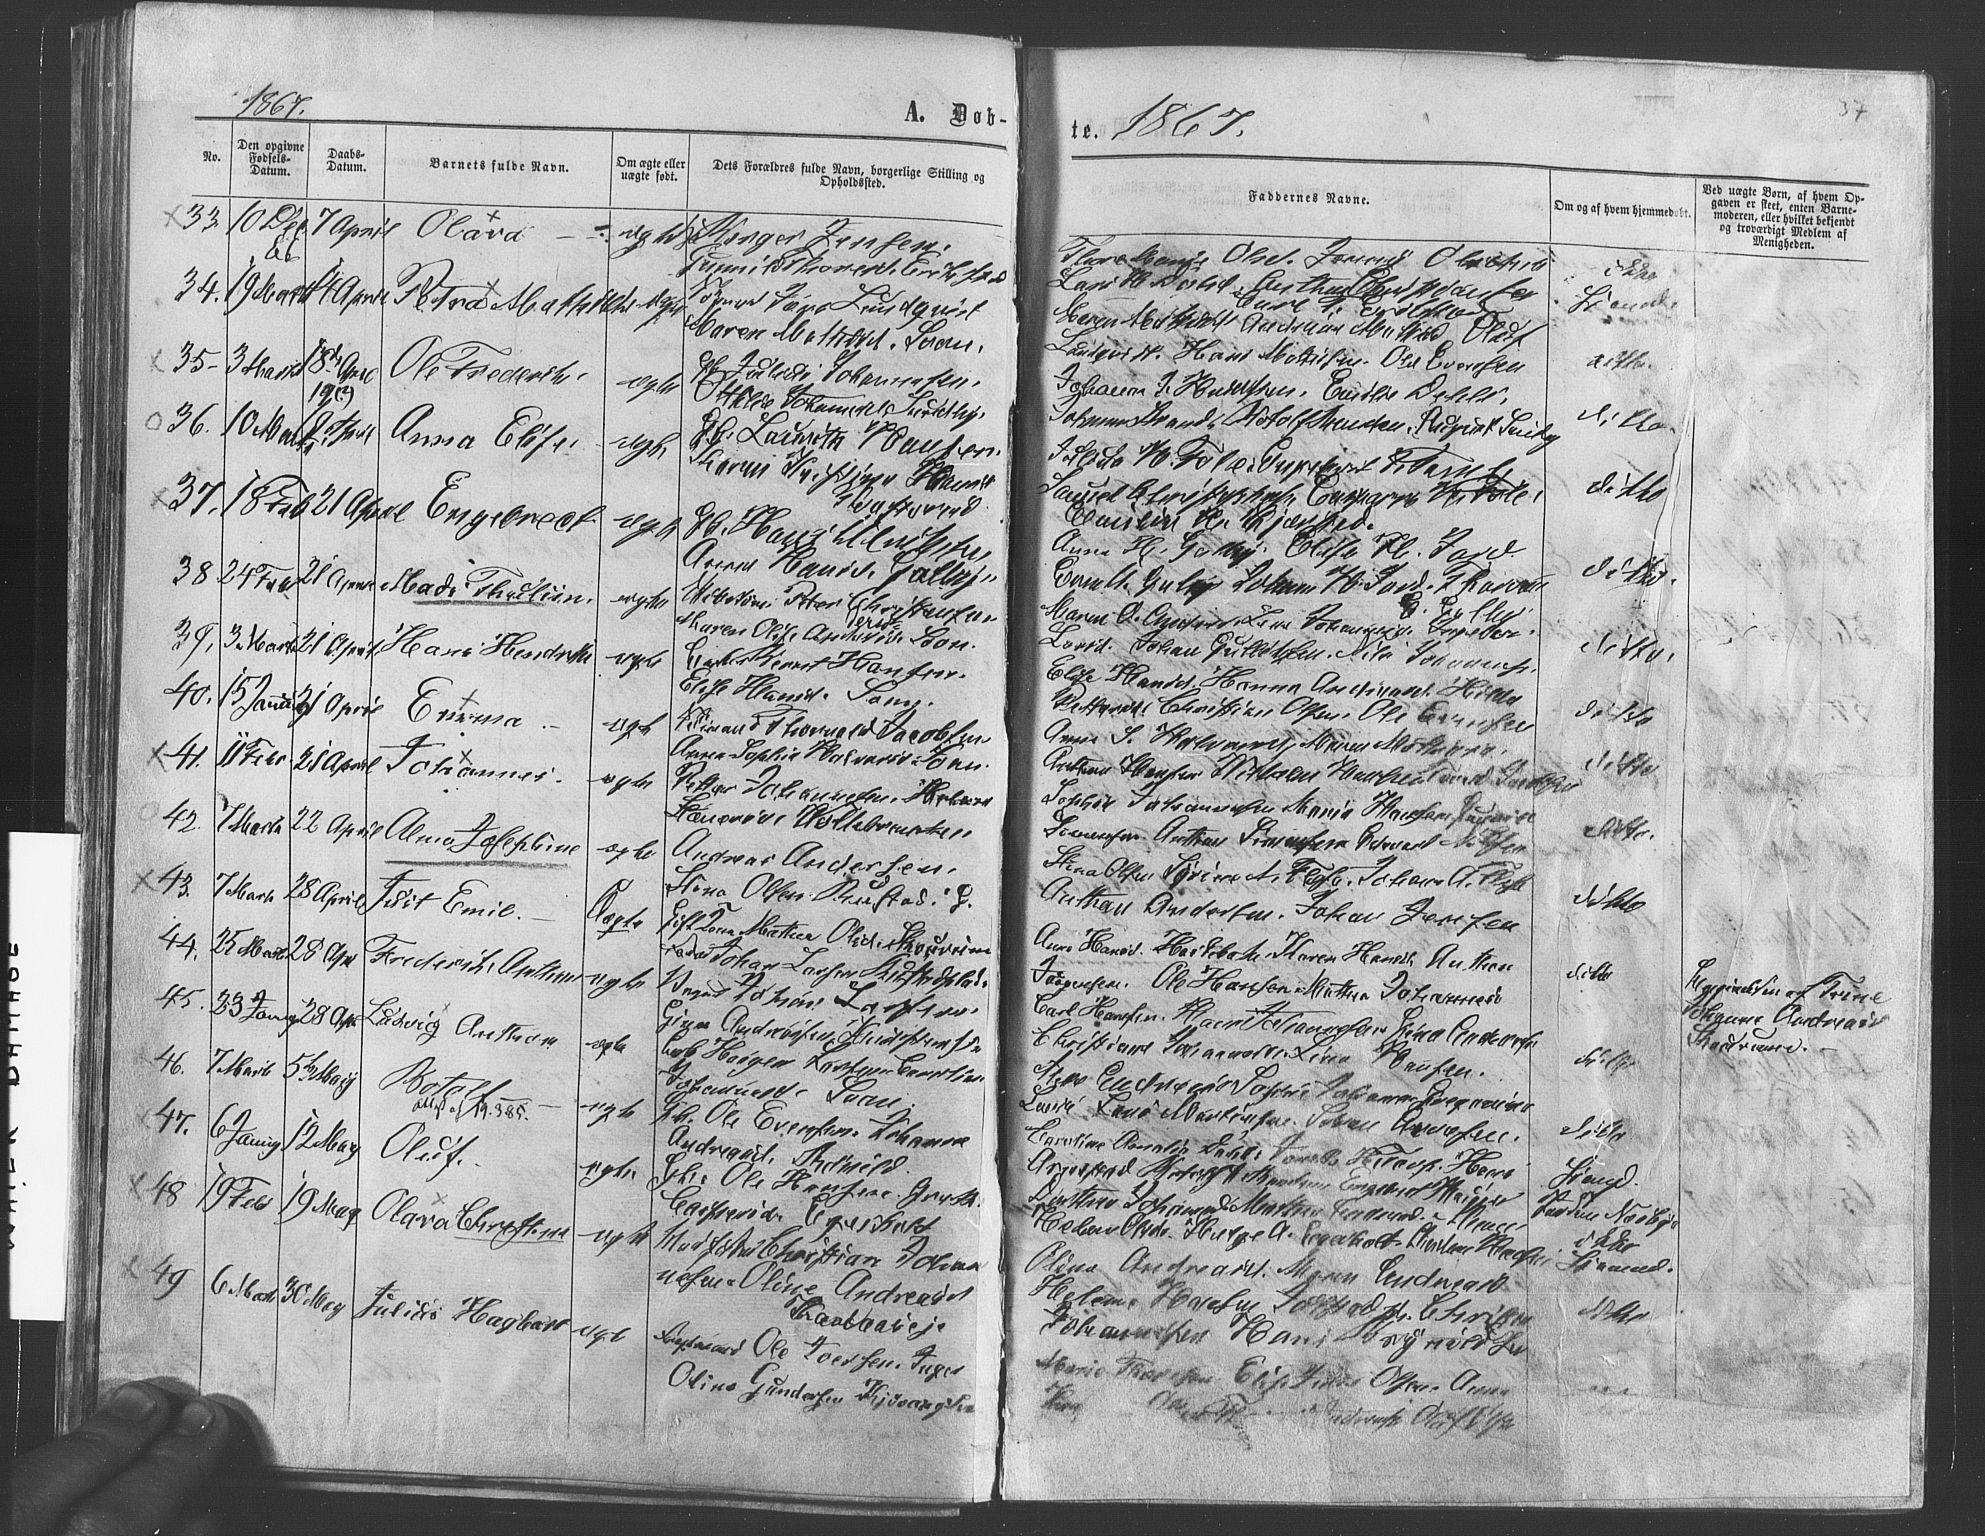 SAO, Vestby prestekontor Kirkebøker, F/Fa/L0008: Parish register (official) no. I 8, 1863-1877, p. 37